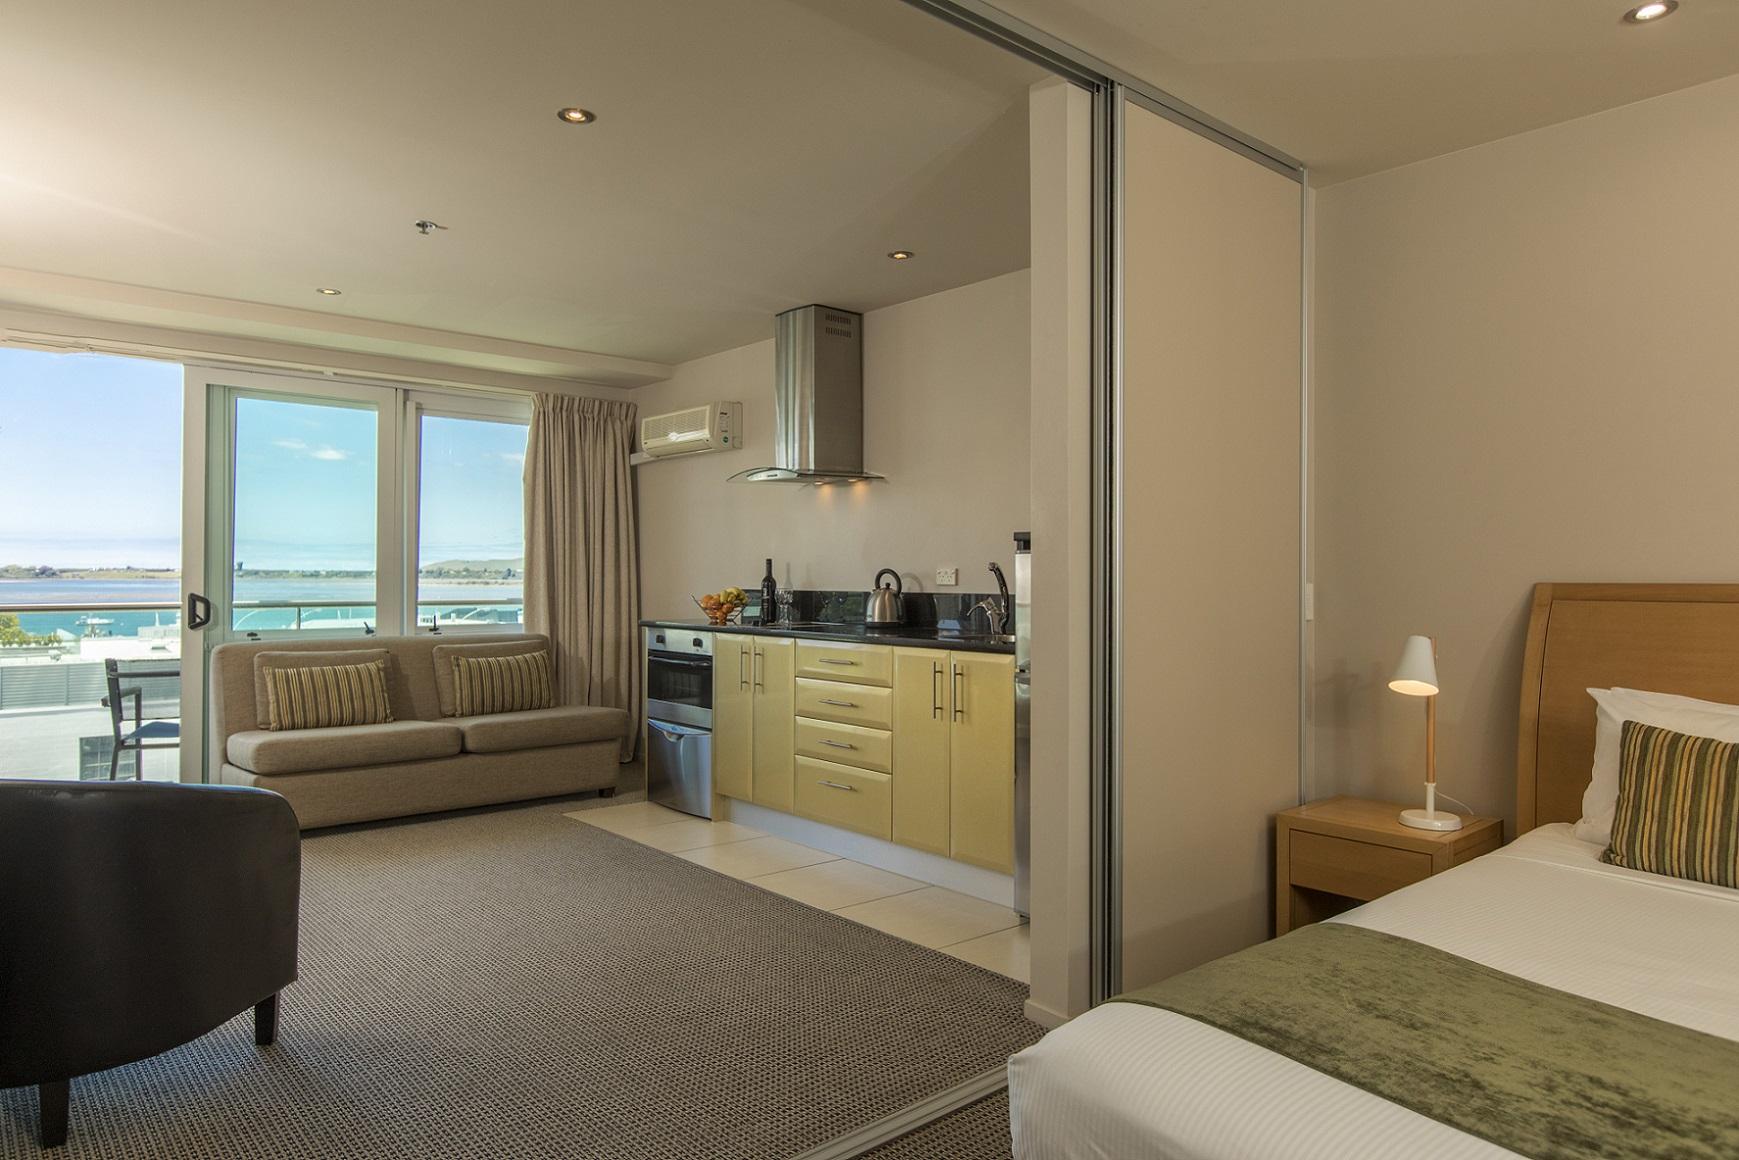 Tauranga Serviced Apartments Tauranga Accommodation Quest On Durham Apartment Hotel